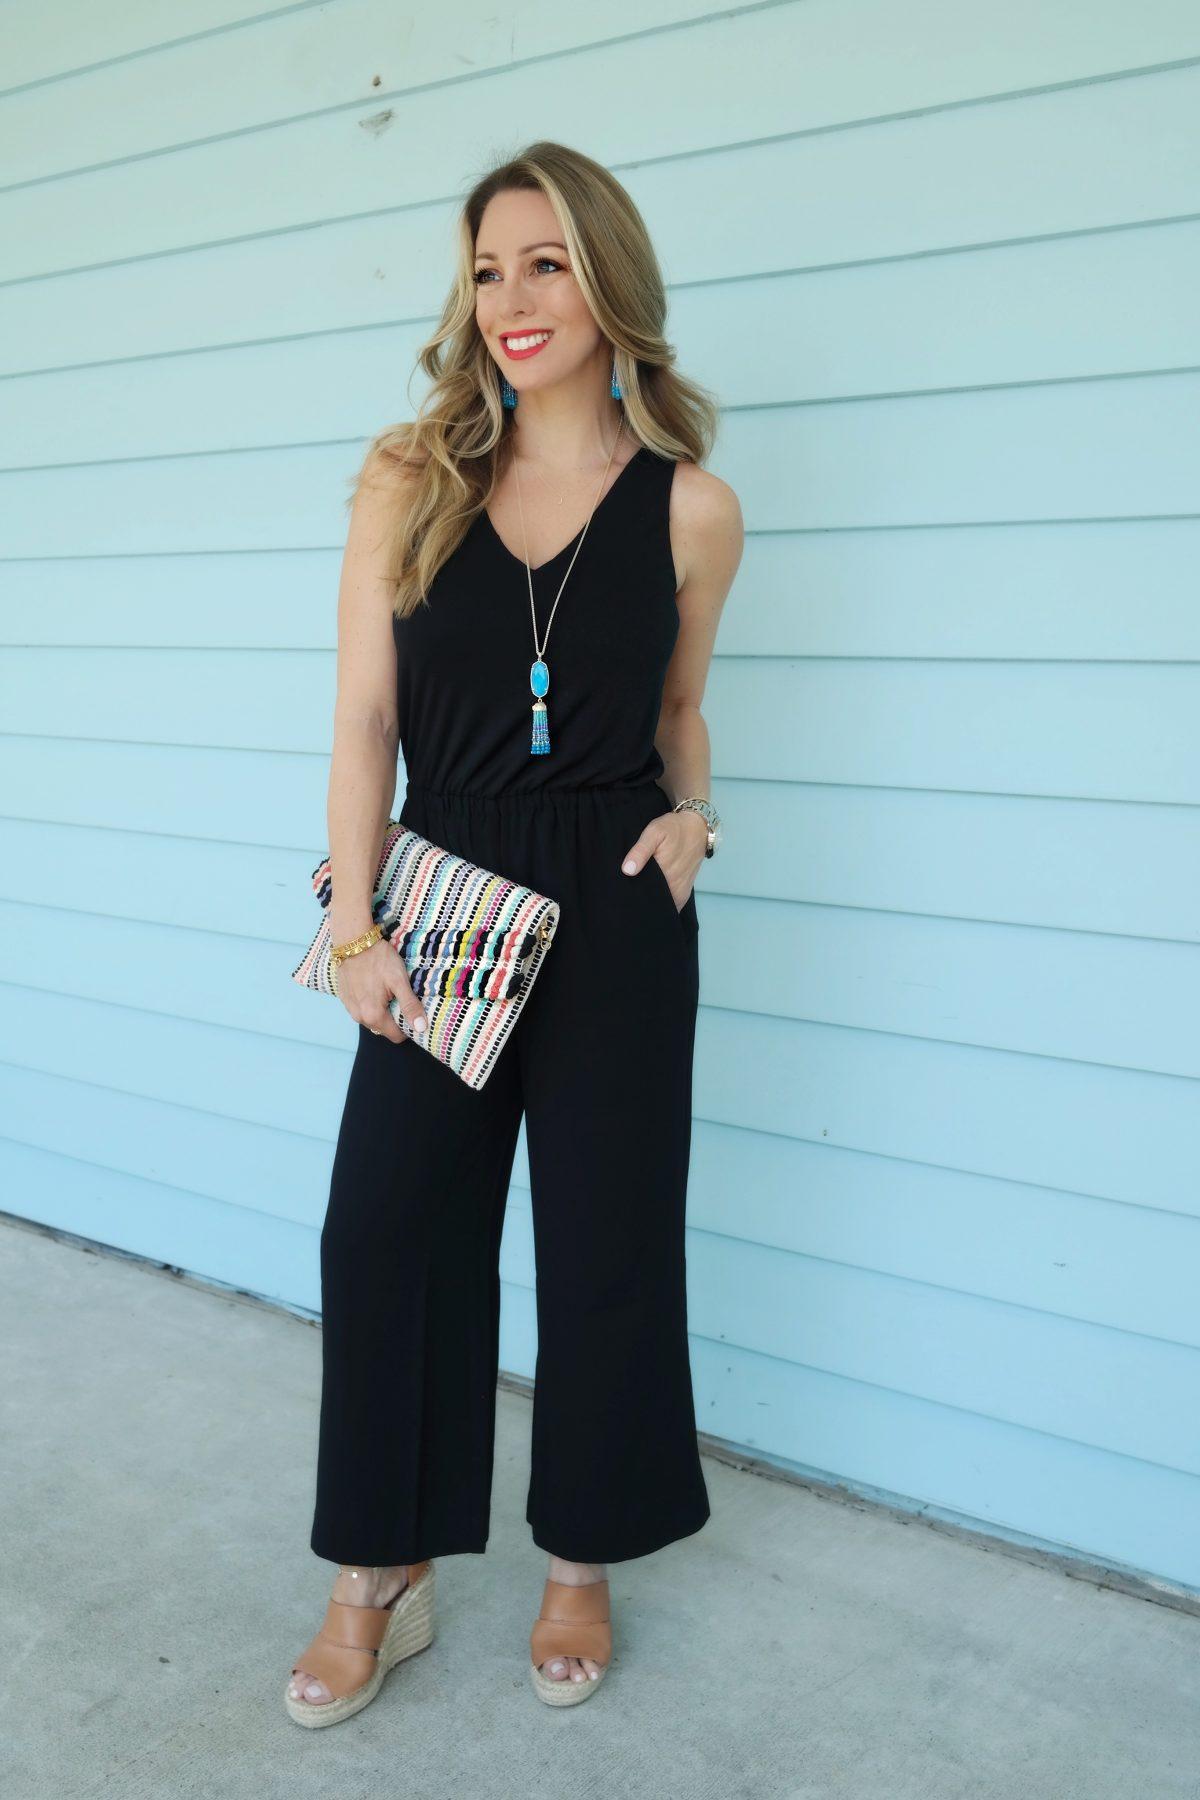 Black Loft jumpsuit with striped clutch and Kendra Scott jewelry